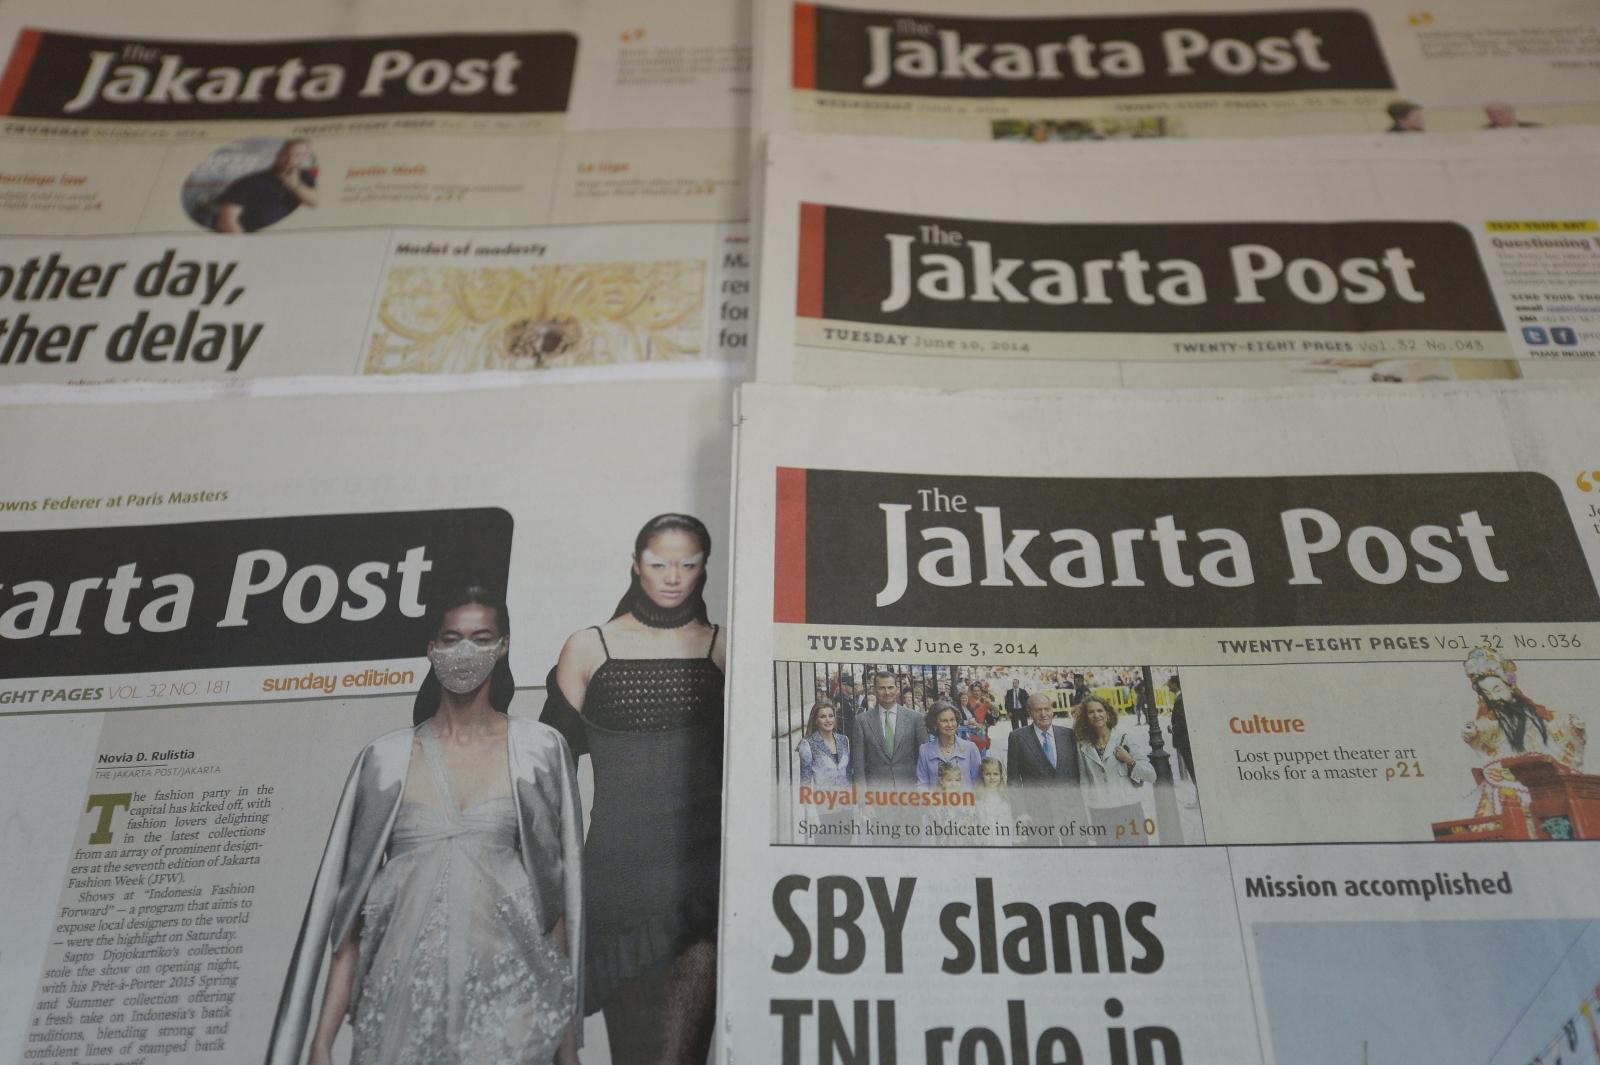 The Jakarta Post ISIS Cartoon Blasphemy